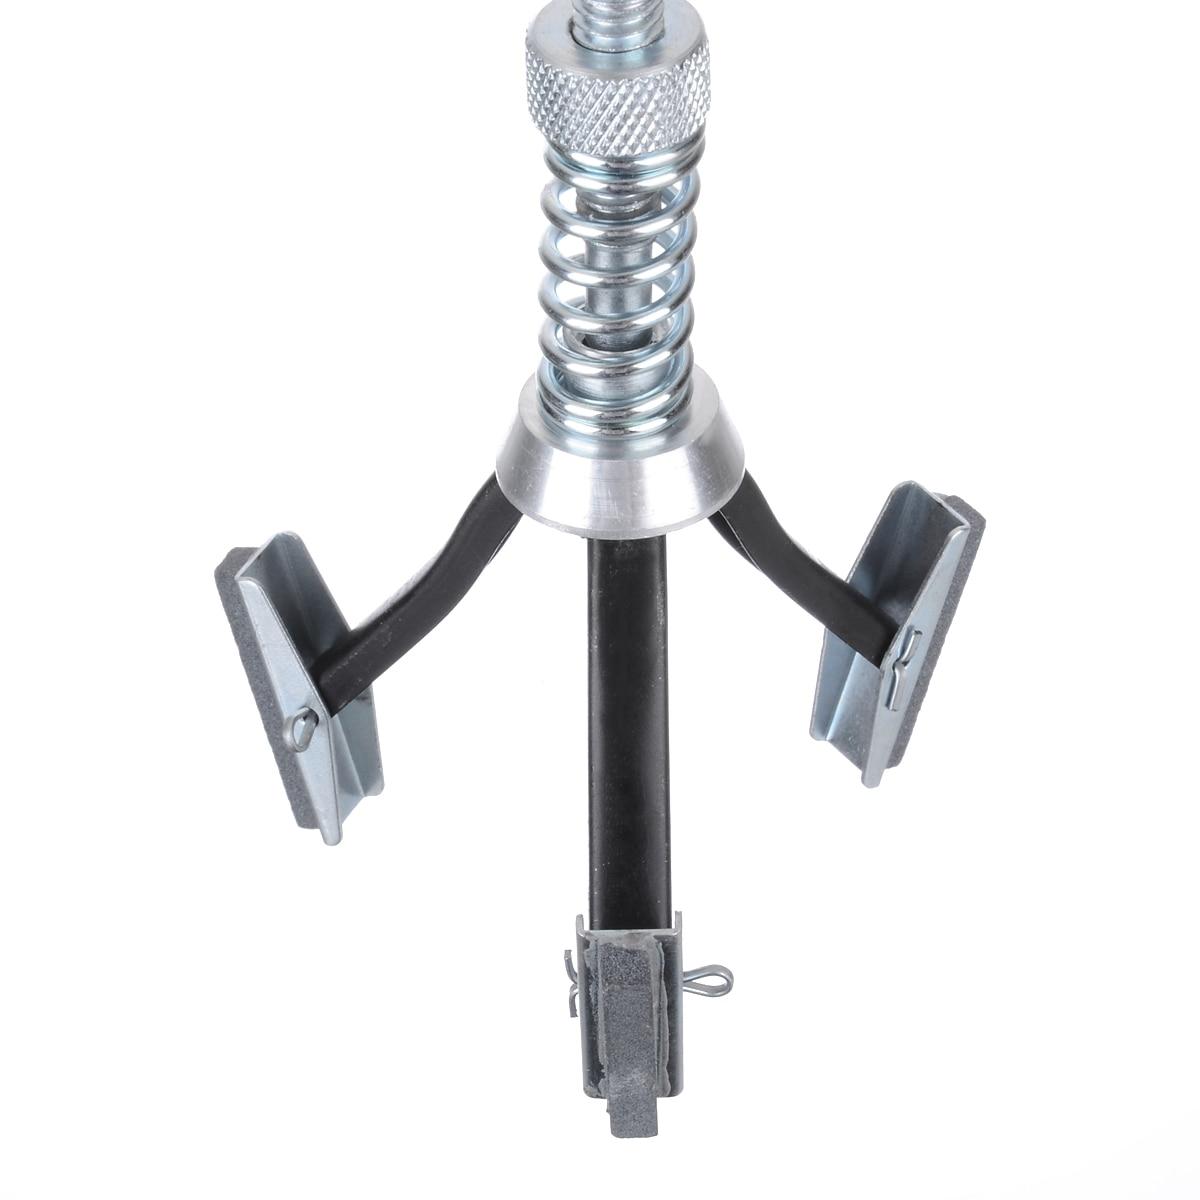 "1"" Car Engine Brake Cylinder Hone Flexible Shaft Bore Honing Tool 18mm to 63mm  3 Jaw Adjustable Cylinder"